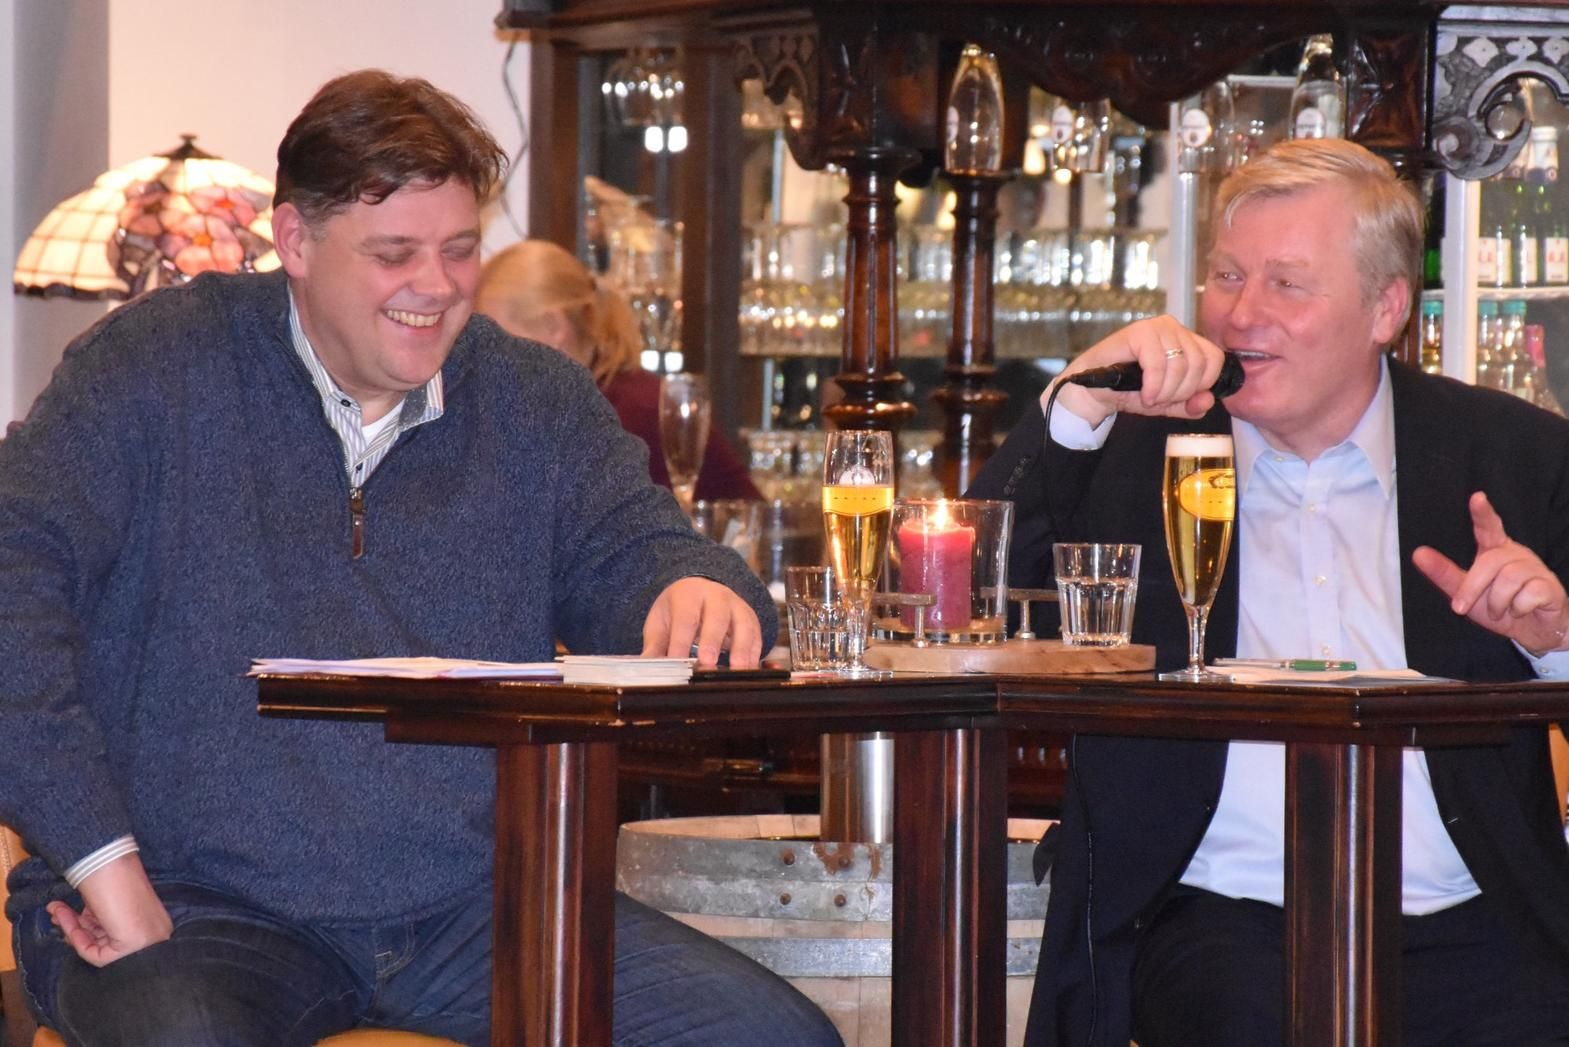 v.l.: Jens Nacke MdL und Bernd Althusmann MdL